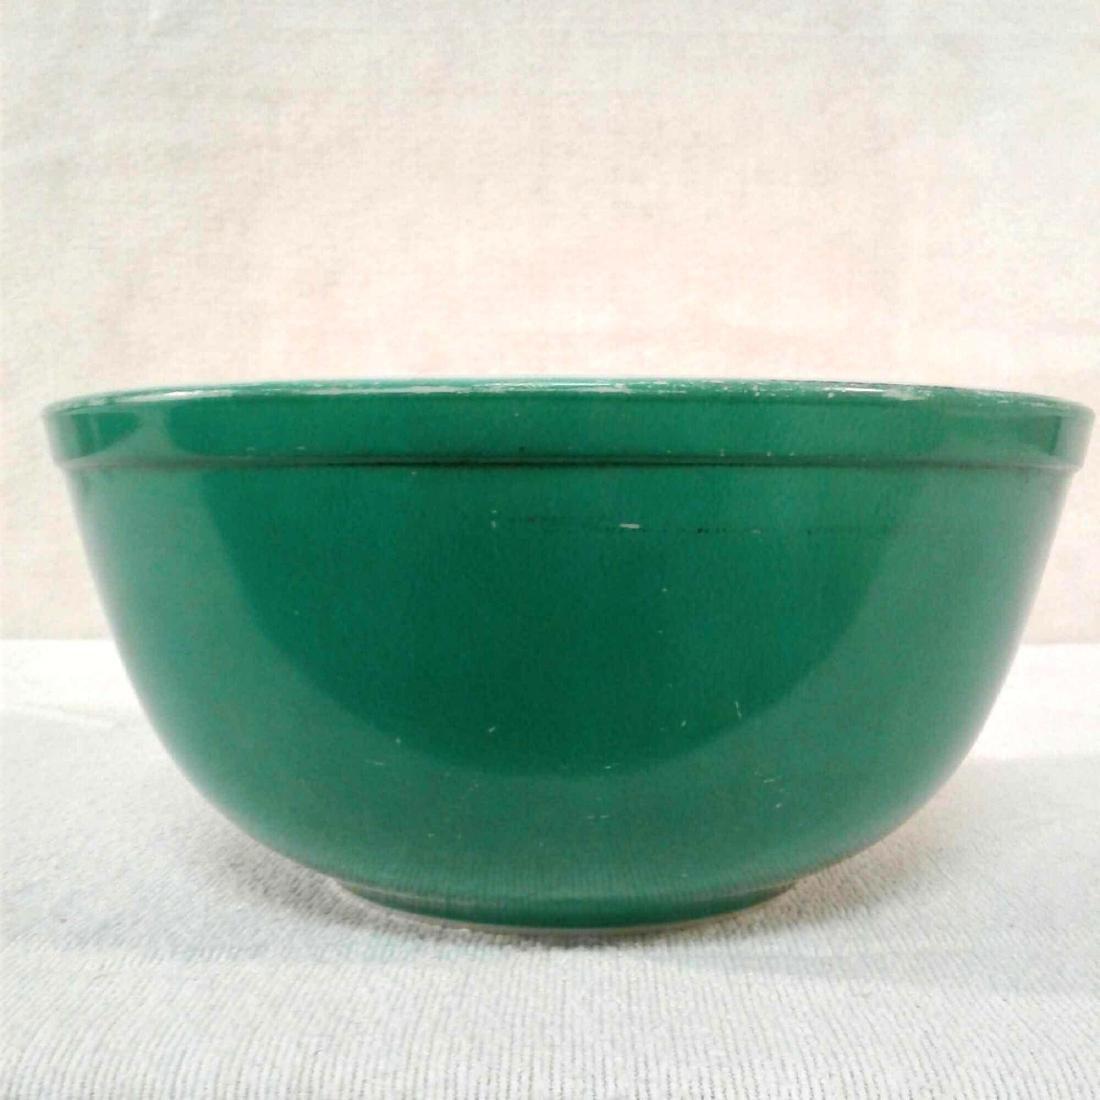 Vintage Green PYREX 403 Mixing Bowl - 2